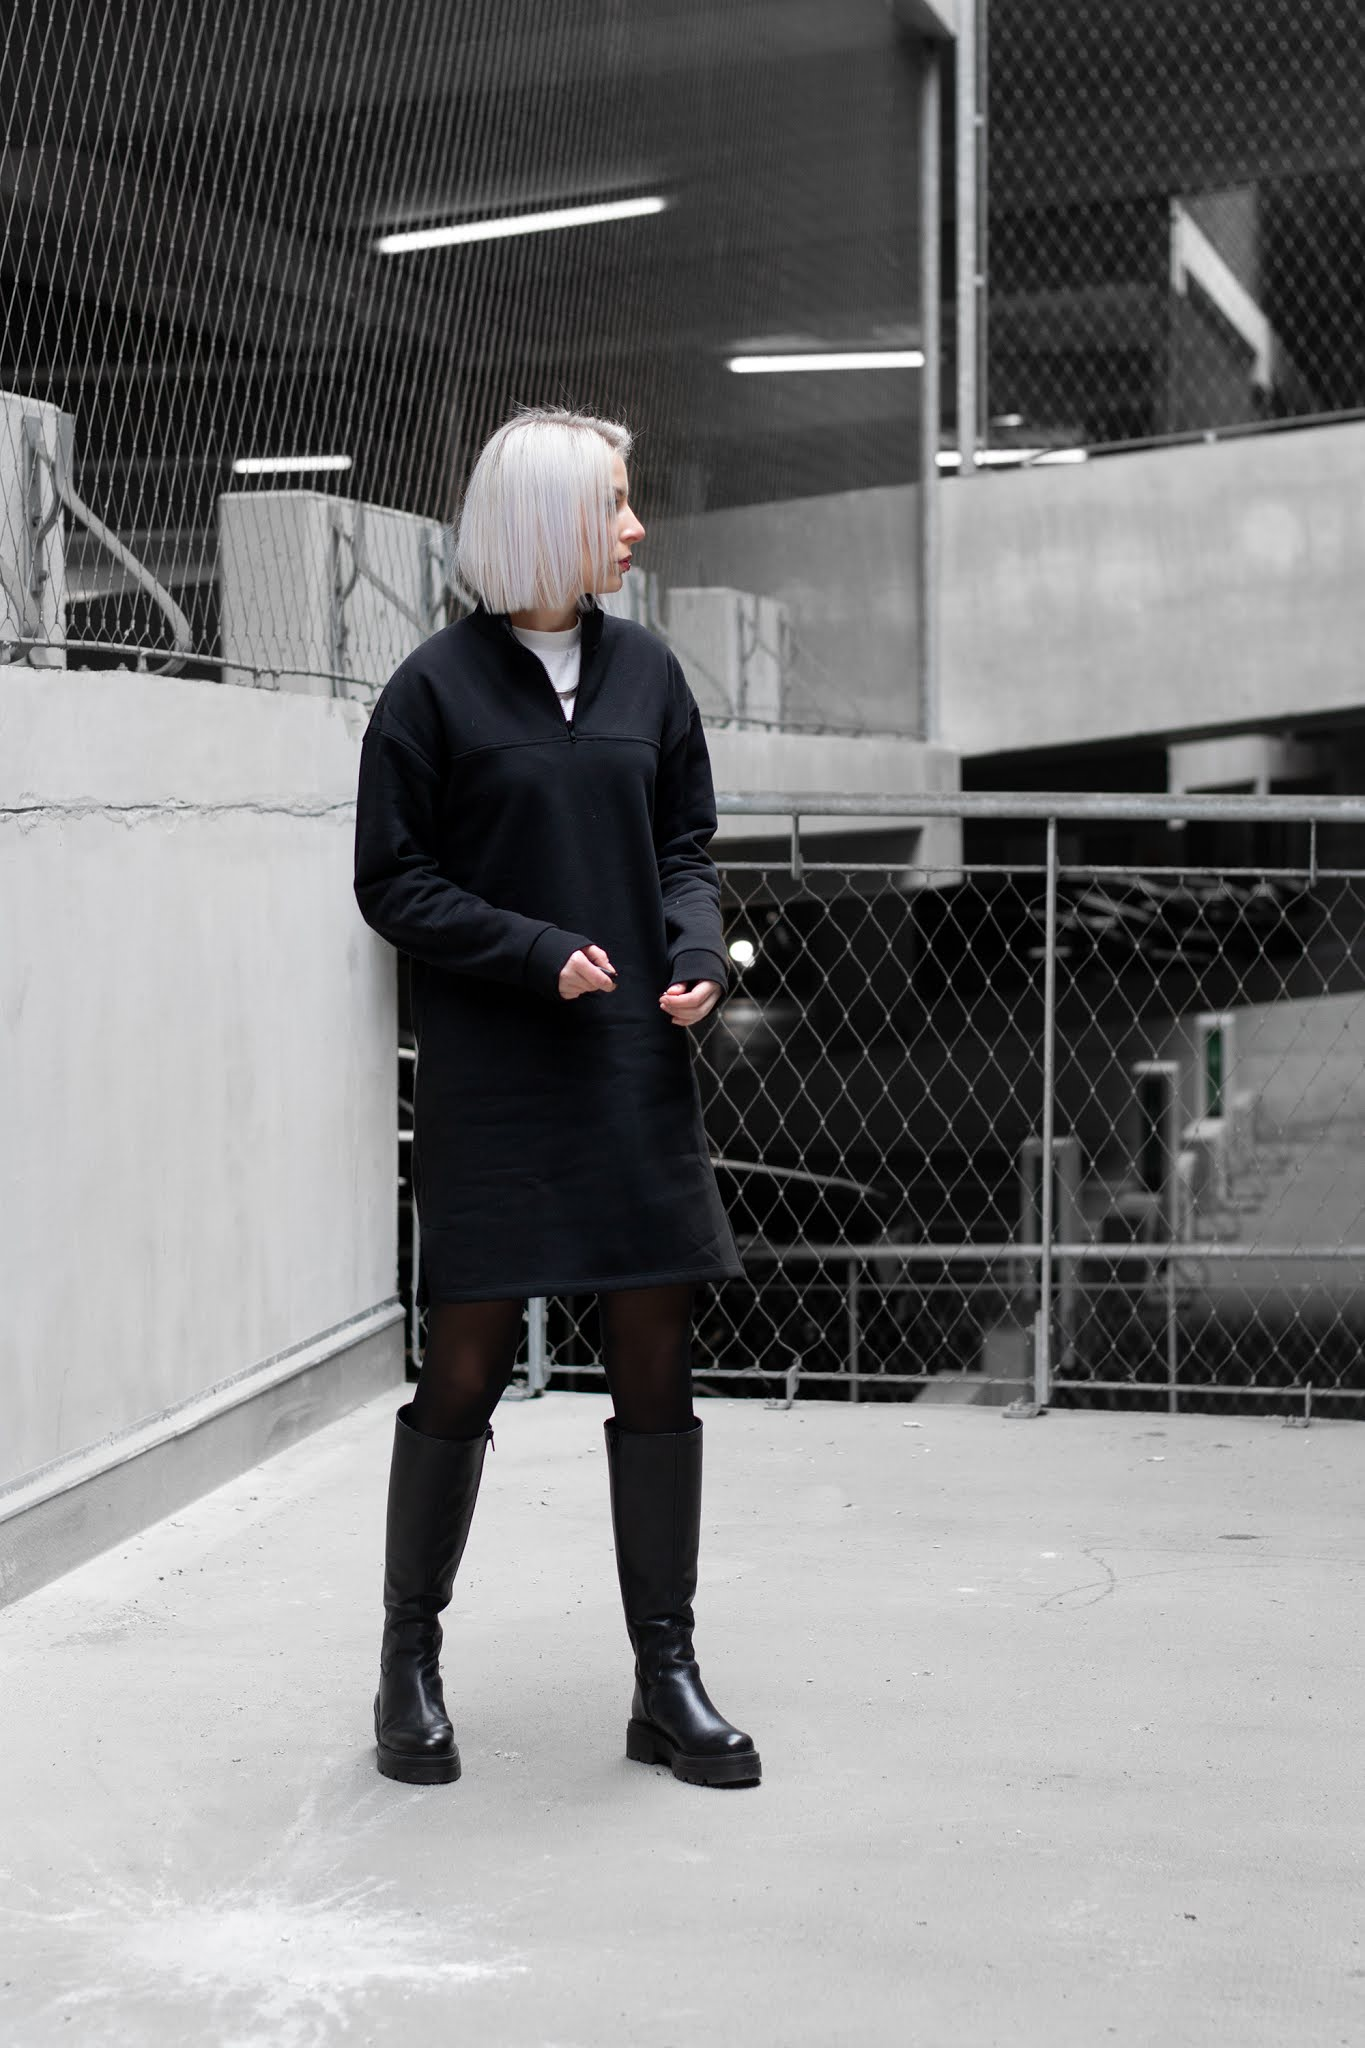 My jewellery, sweater dress, sacha shoes, boots, falke tights, all black, minimal